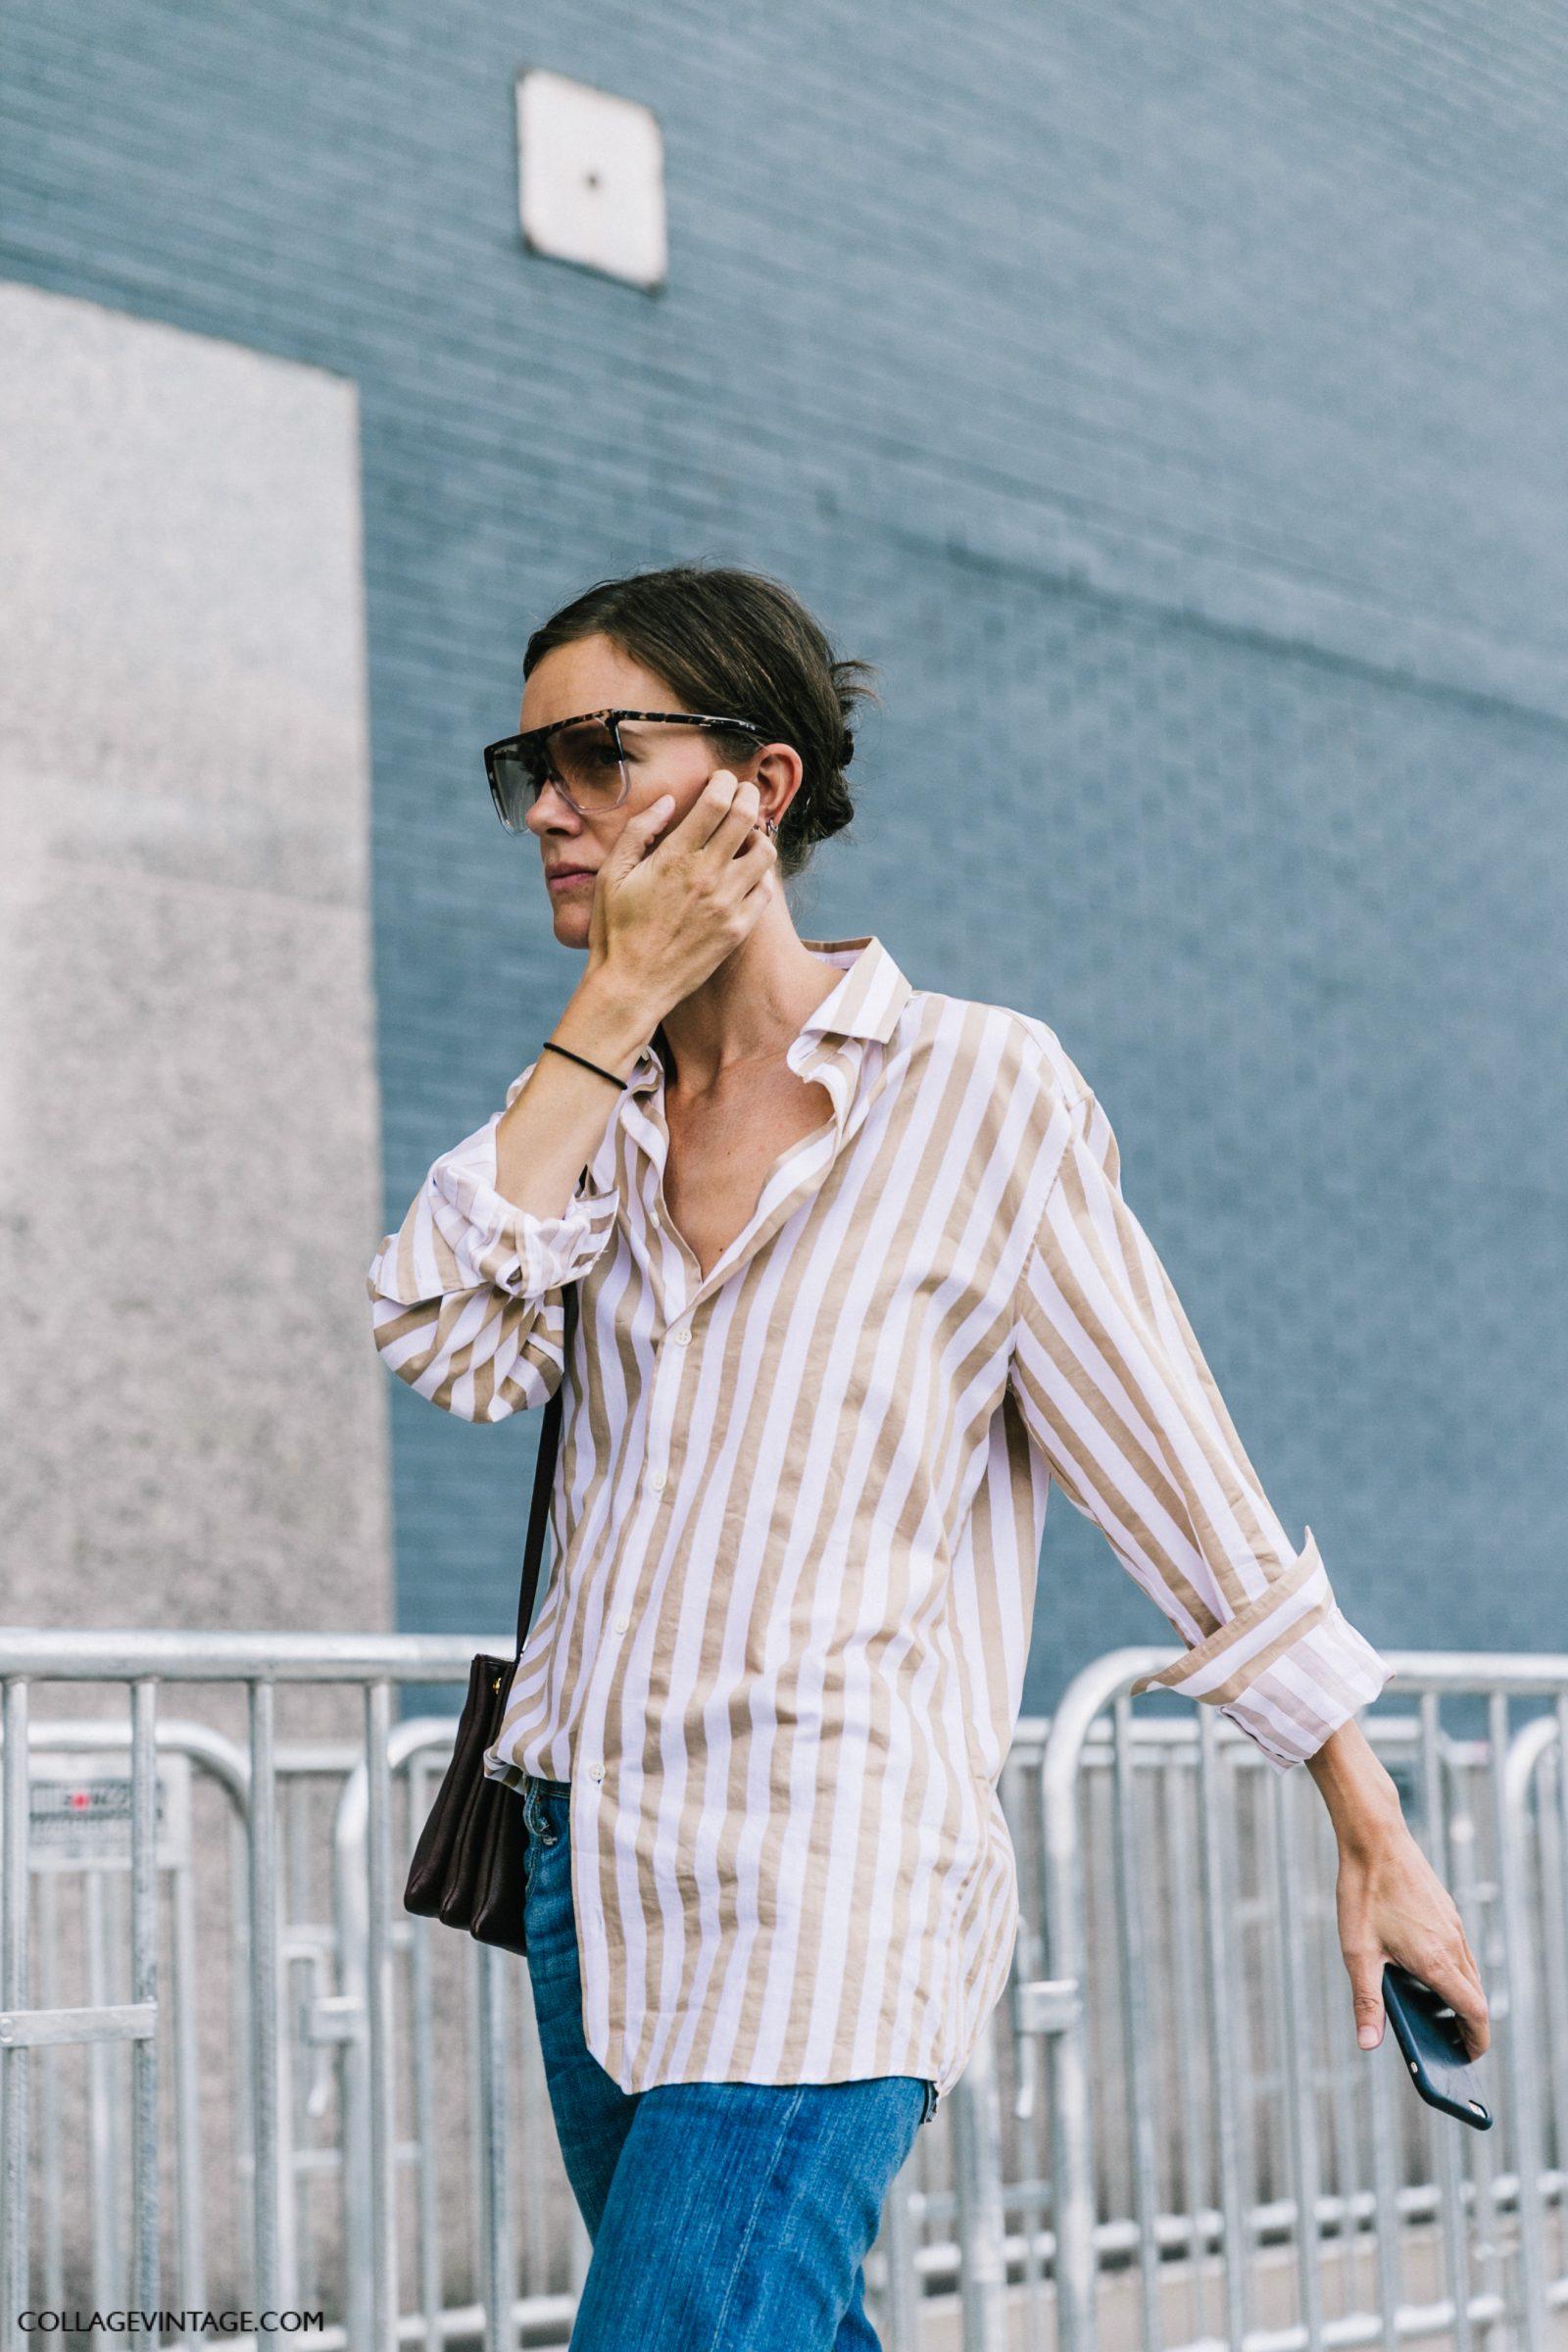 nyfw-new_york_fashion_week_ss17-street_style-outfits-collage_vintage-vintage-atuzarra-94